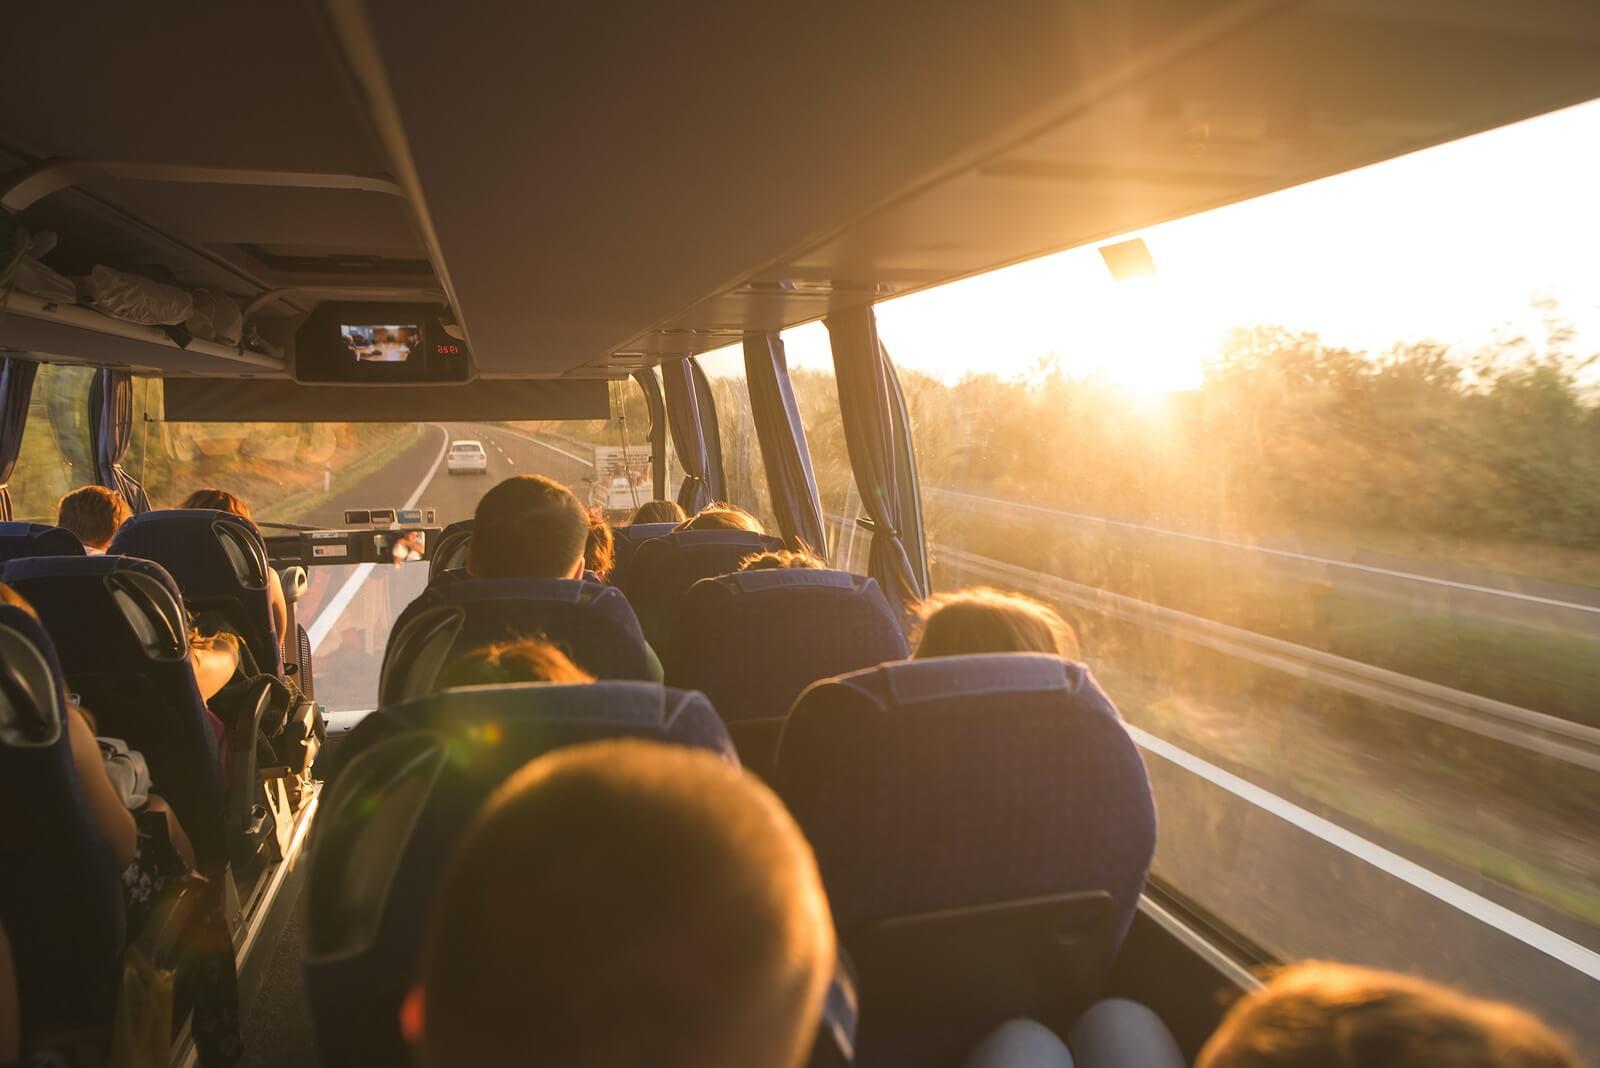 tour bus accident vegas